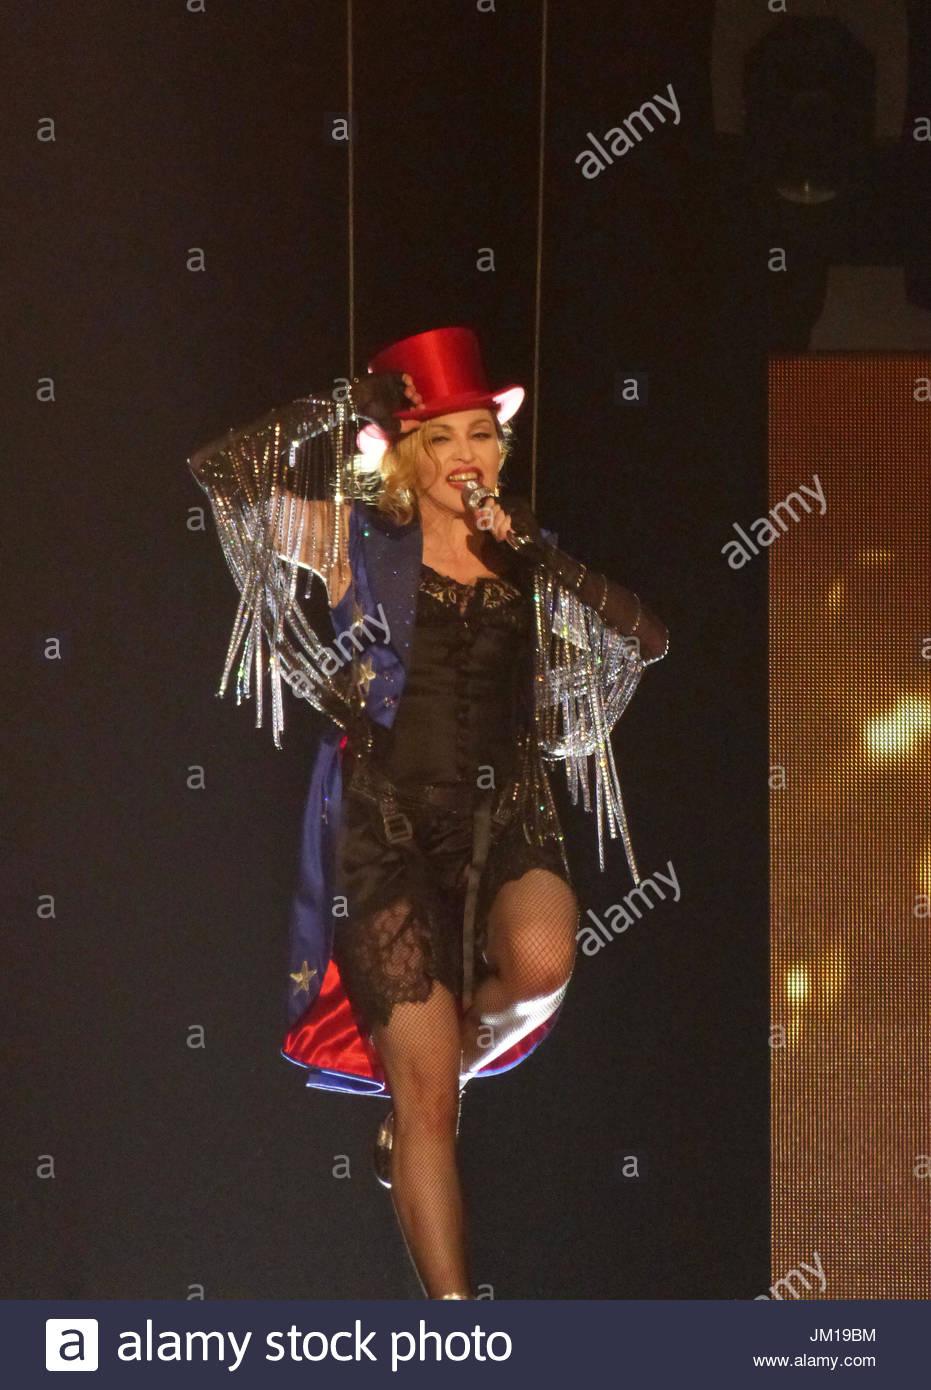 Madonna fashion show san luis obispo - Madonna Rebel Heart Tour In Washington D C Stock Image